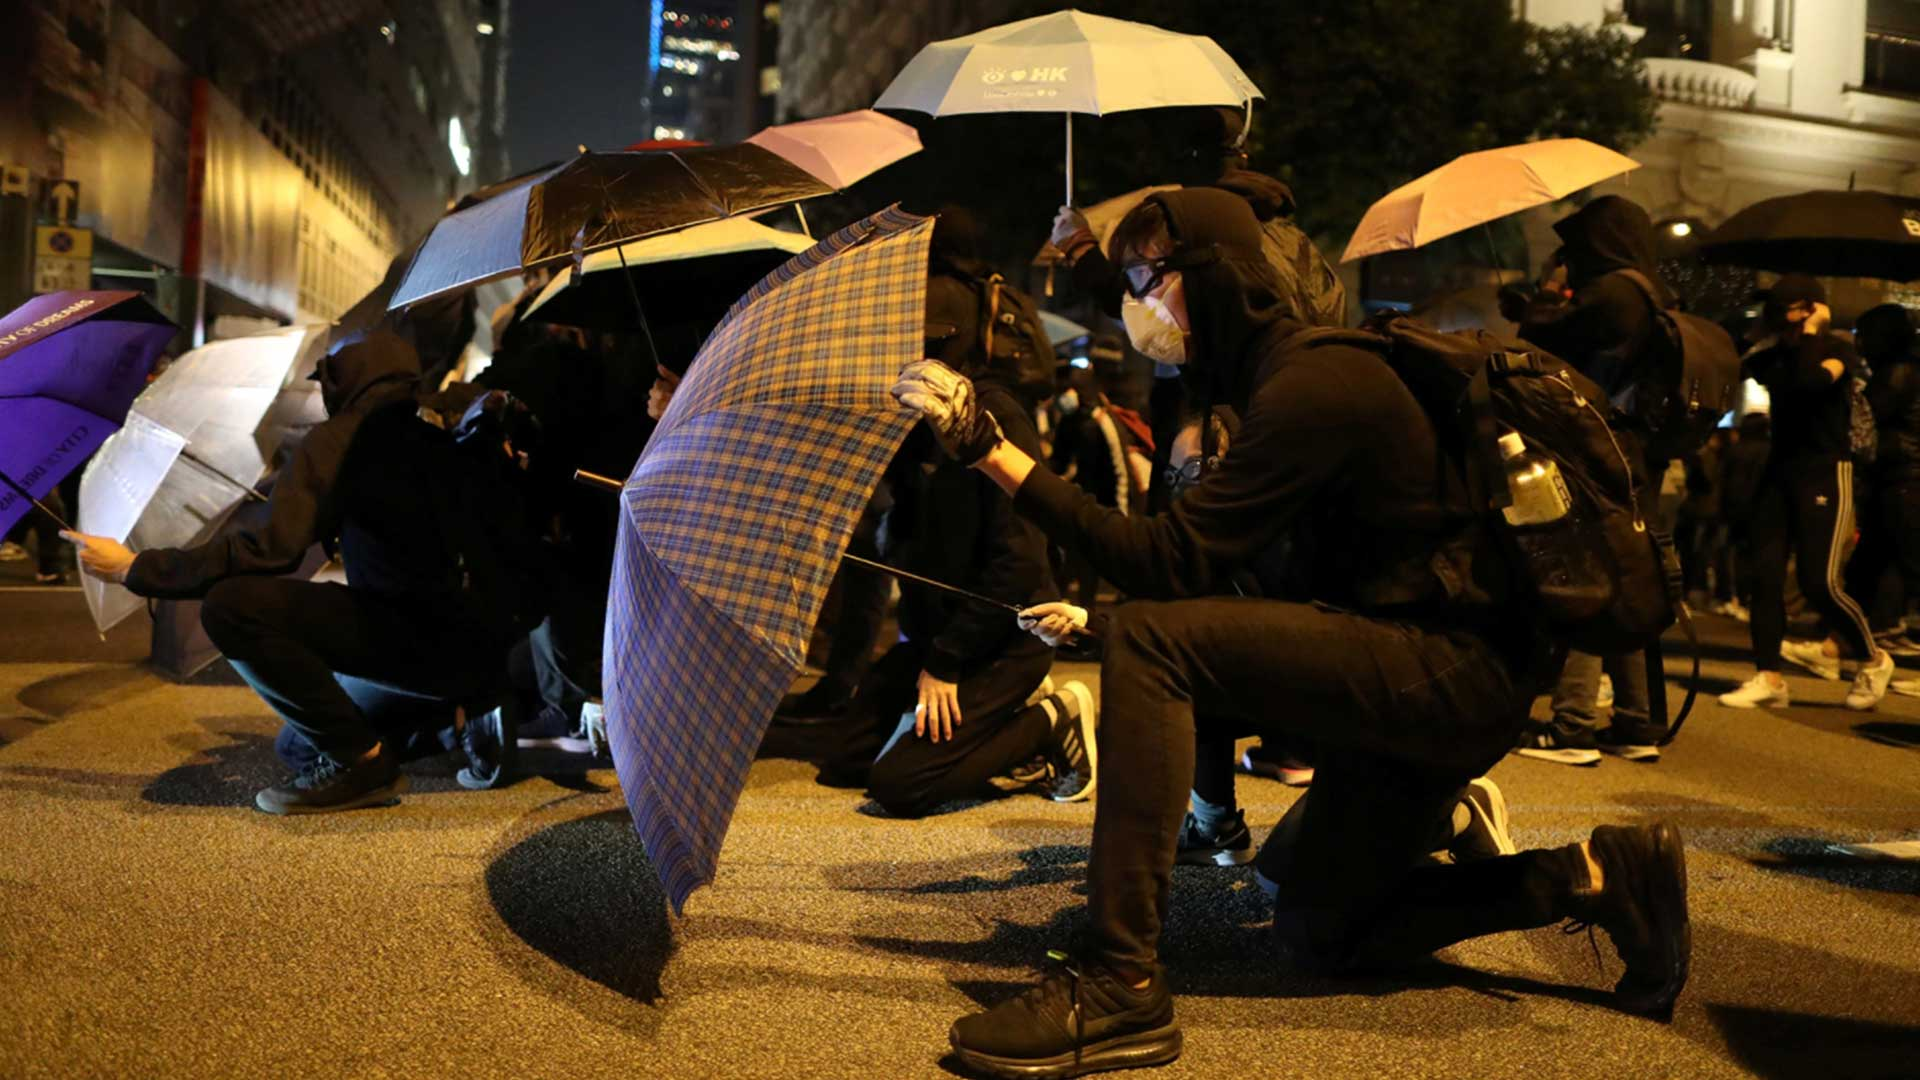 Hong Kong llei de seguretat nacional